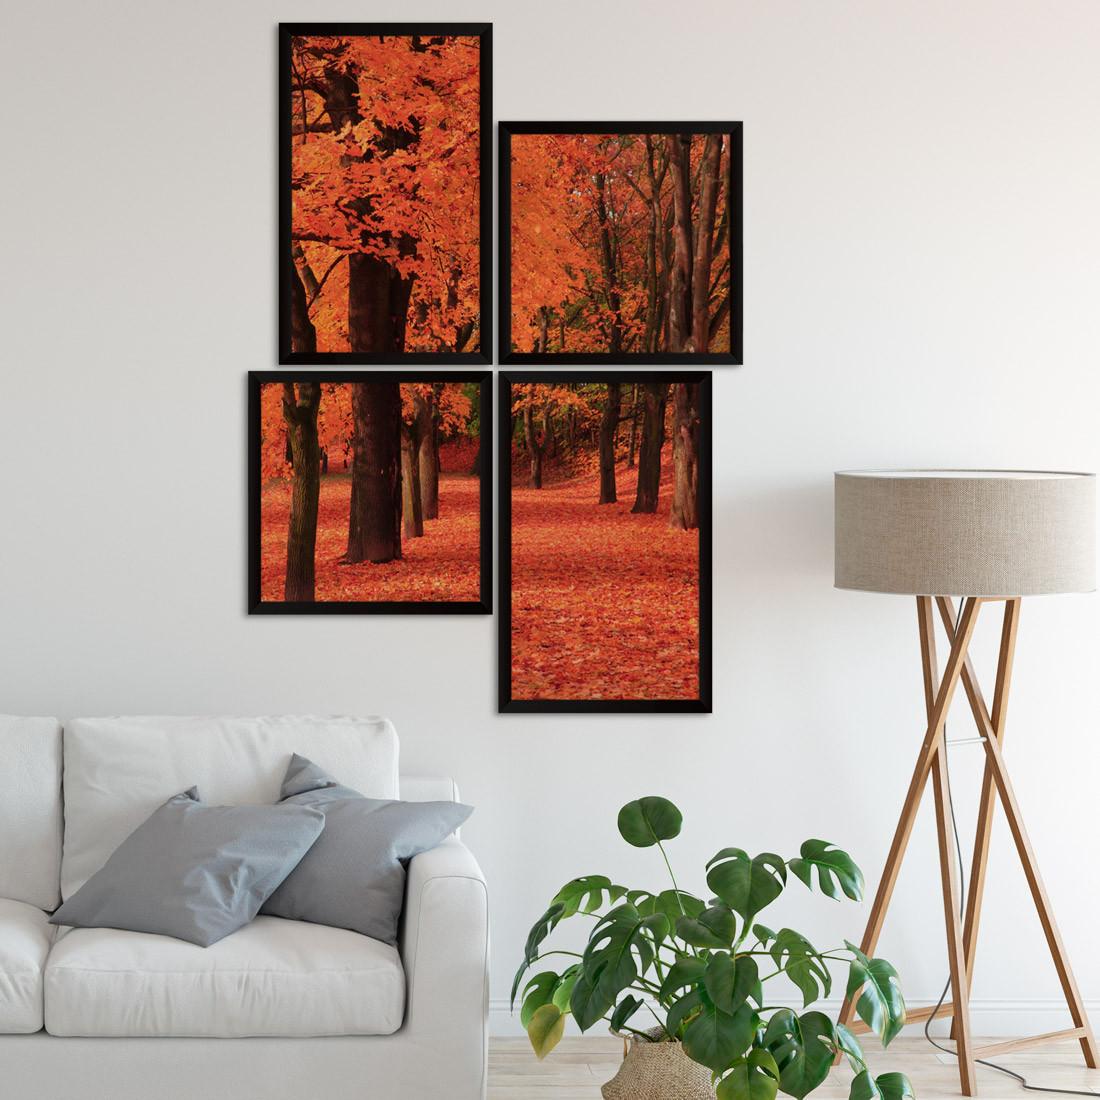 Conjuntos de Quadros Decorativos Assimétrico Árvore Laranja